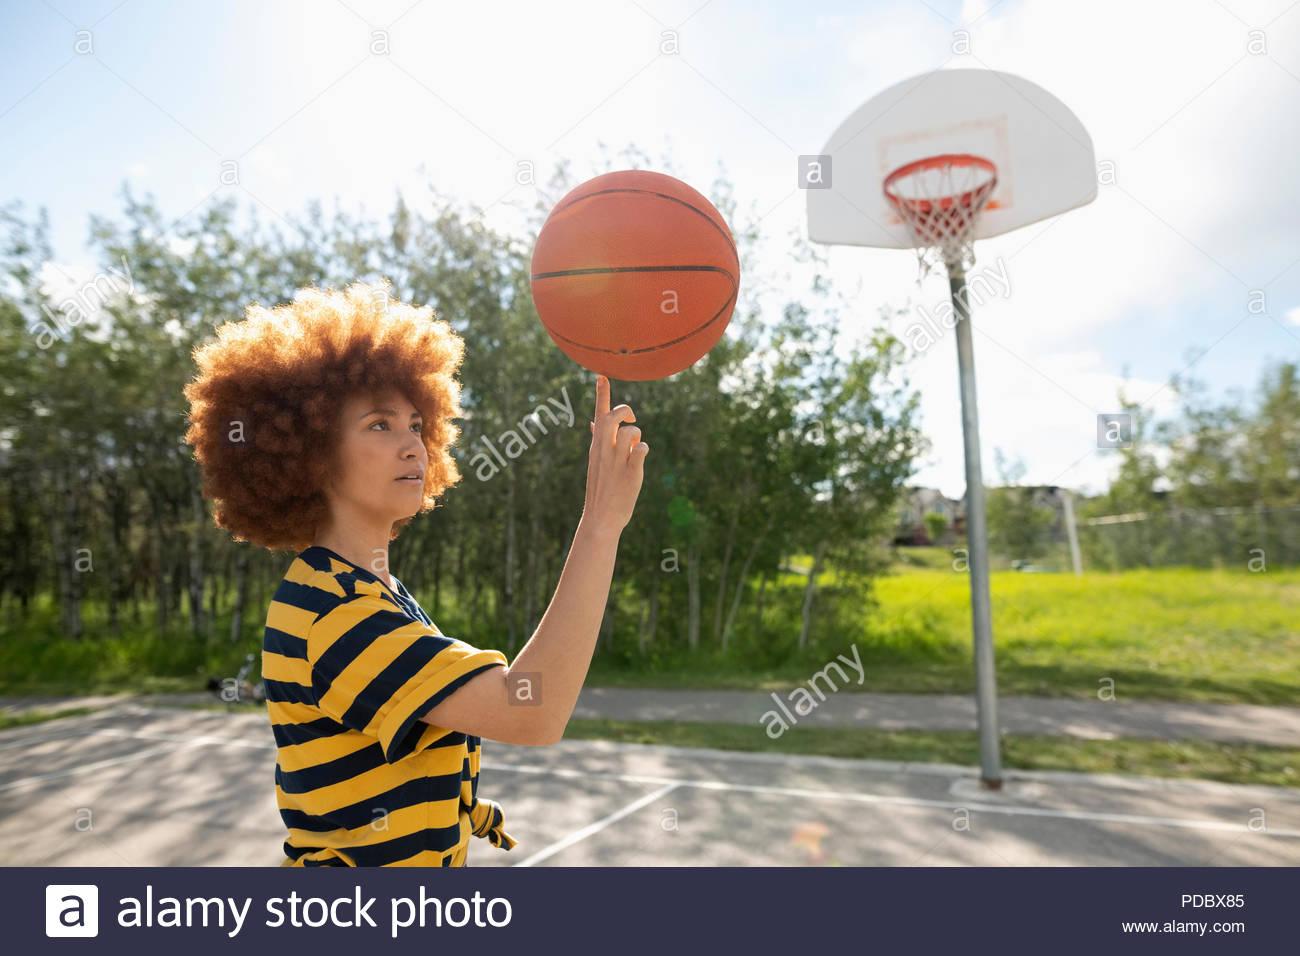 Cool adolescente con equilibrio afro basketball en dedo en estacionamiento cancha de baloncesto Imagen De Stock